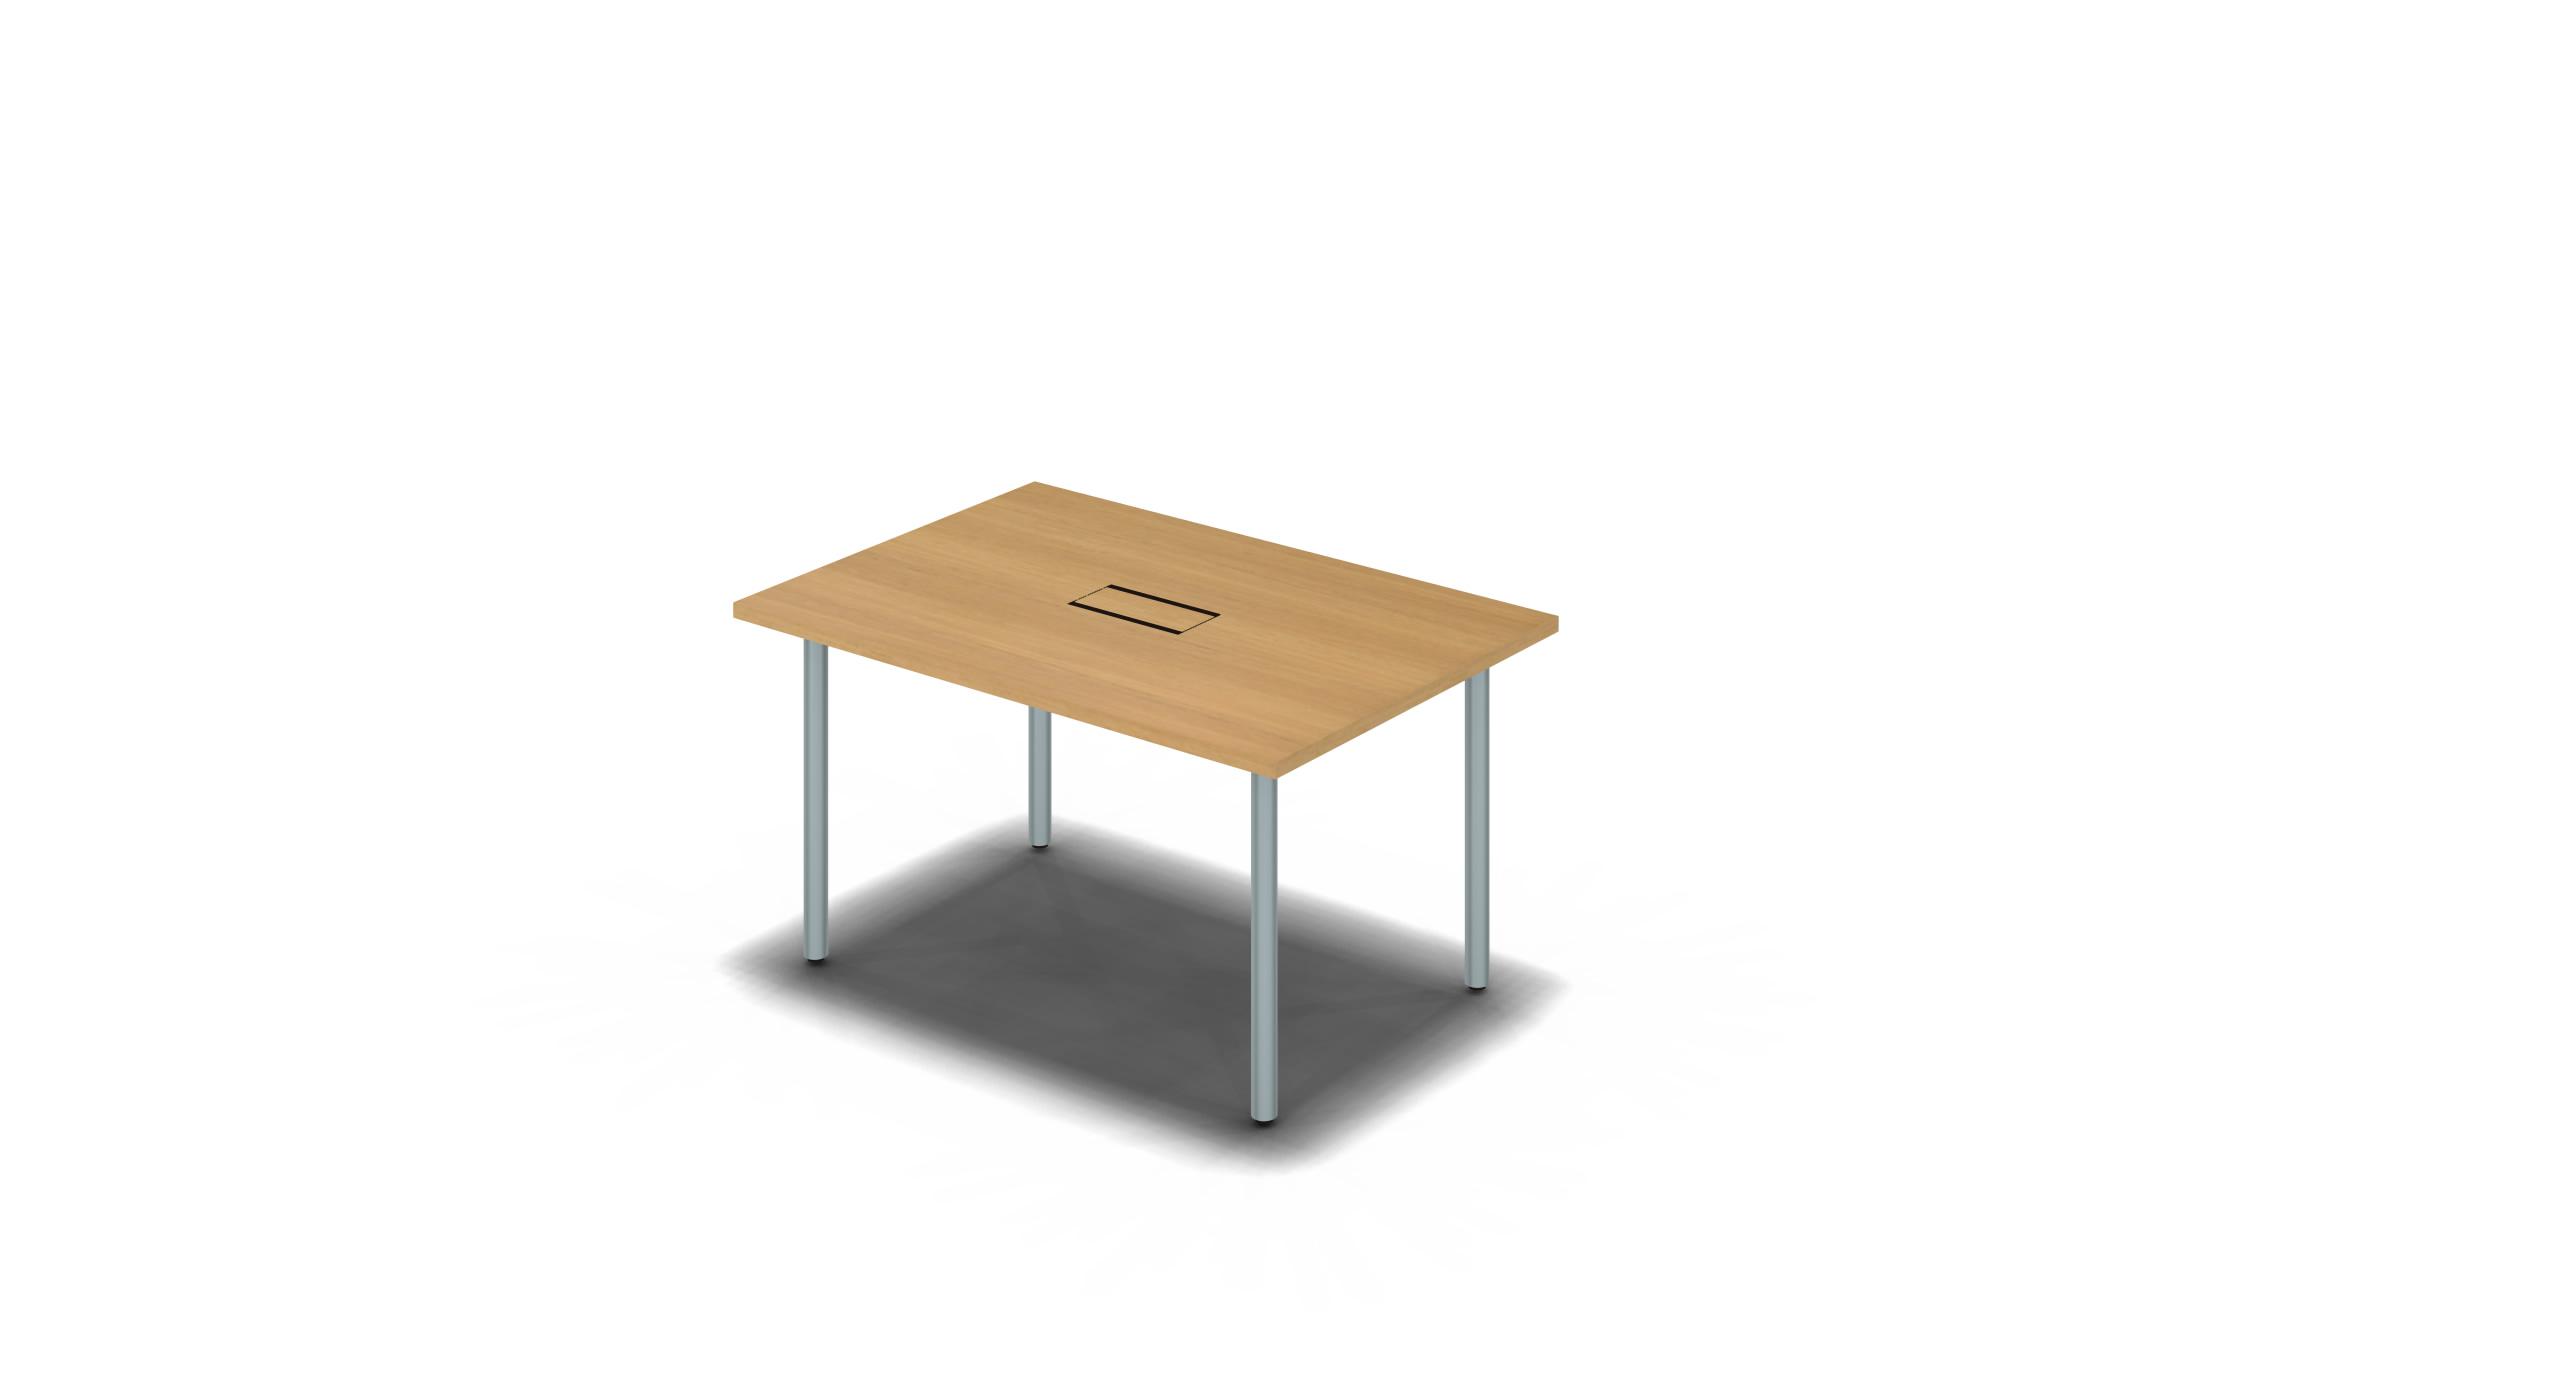 Table_Round_1200x800_Silver_Oak_withOption